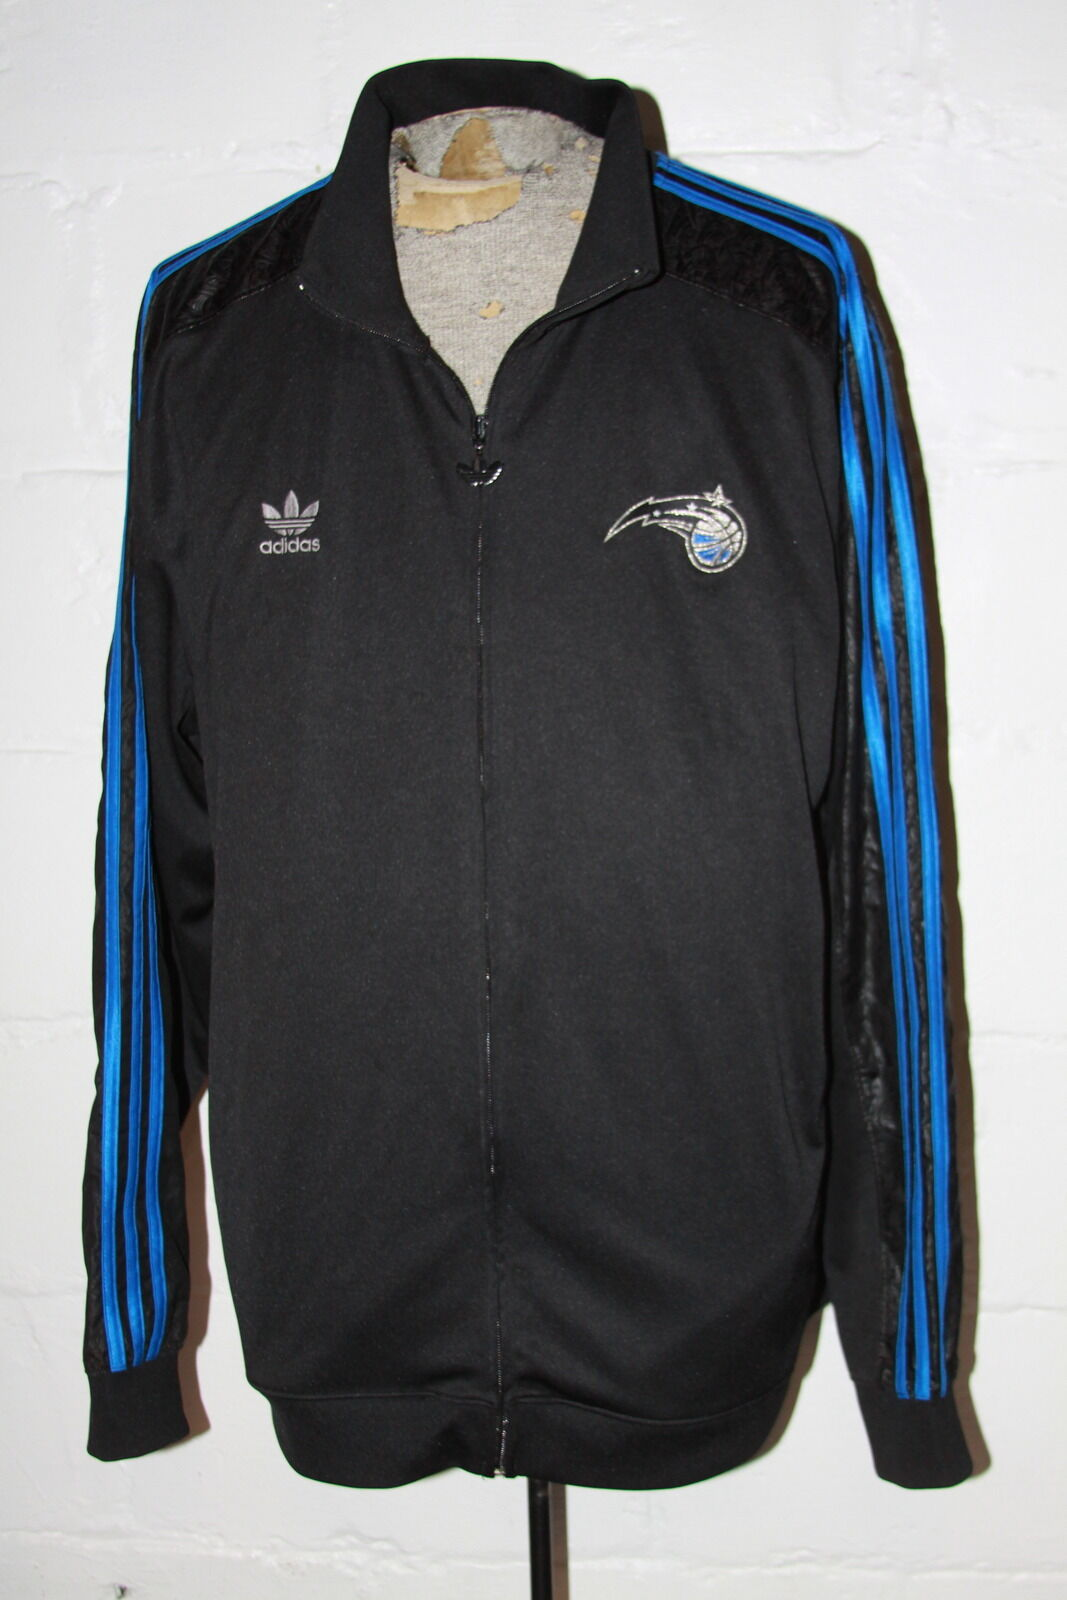 a01300edc EUC Adidas Adidas Adidas Limited Edition NBA Orlando Magic Full Zip Track  Jacket Sz 2XL XXL